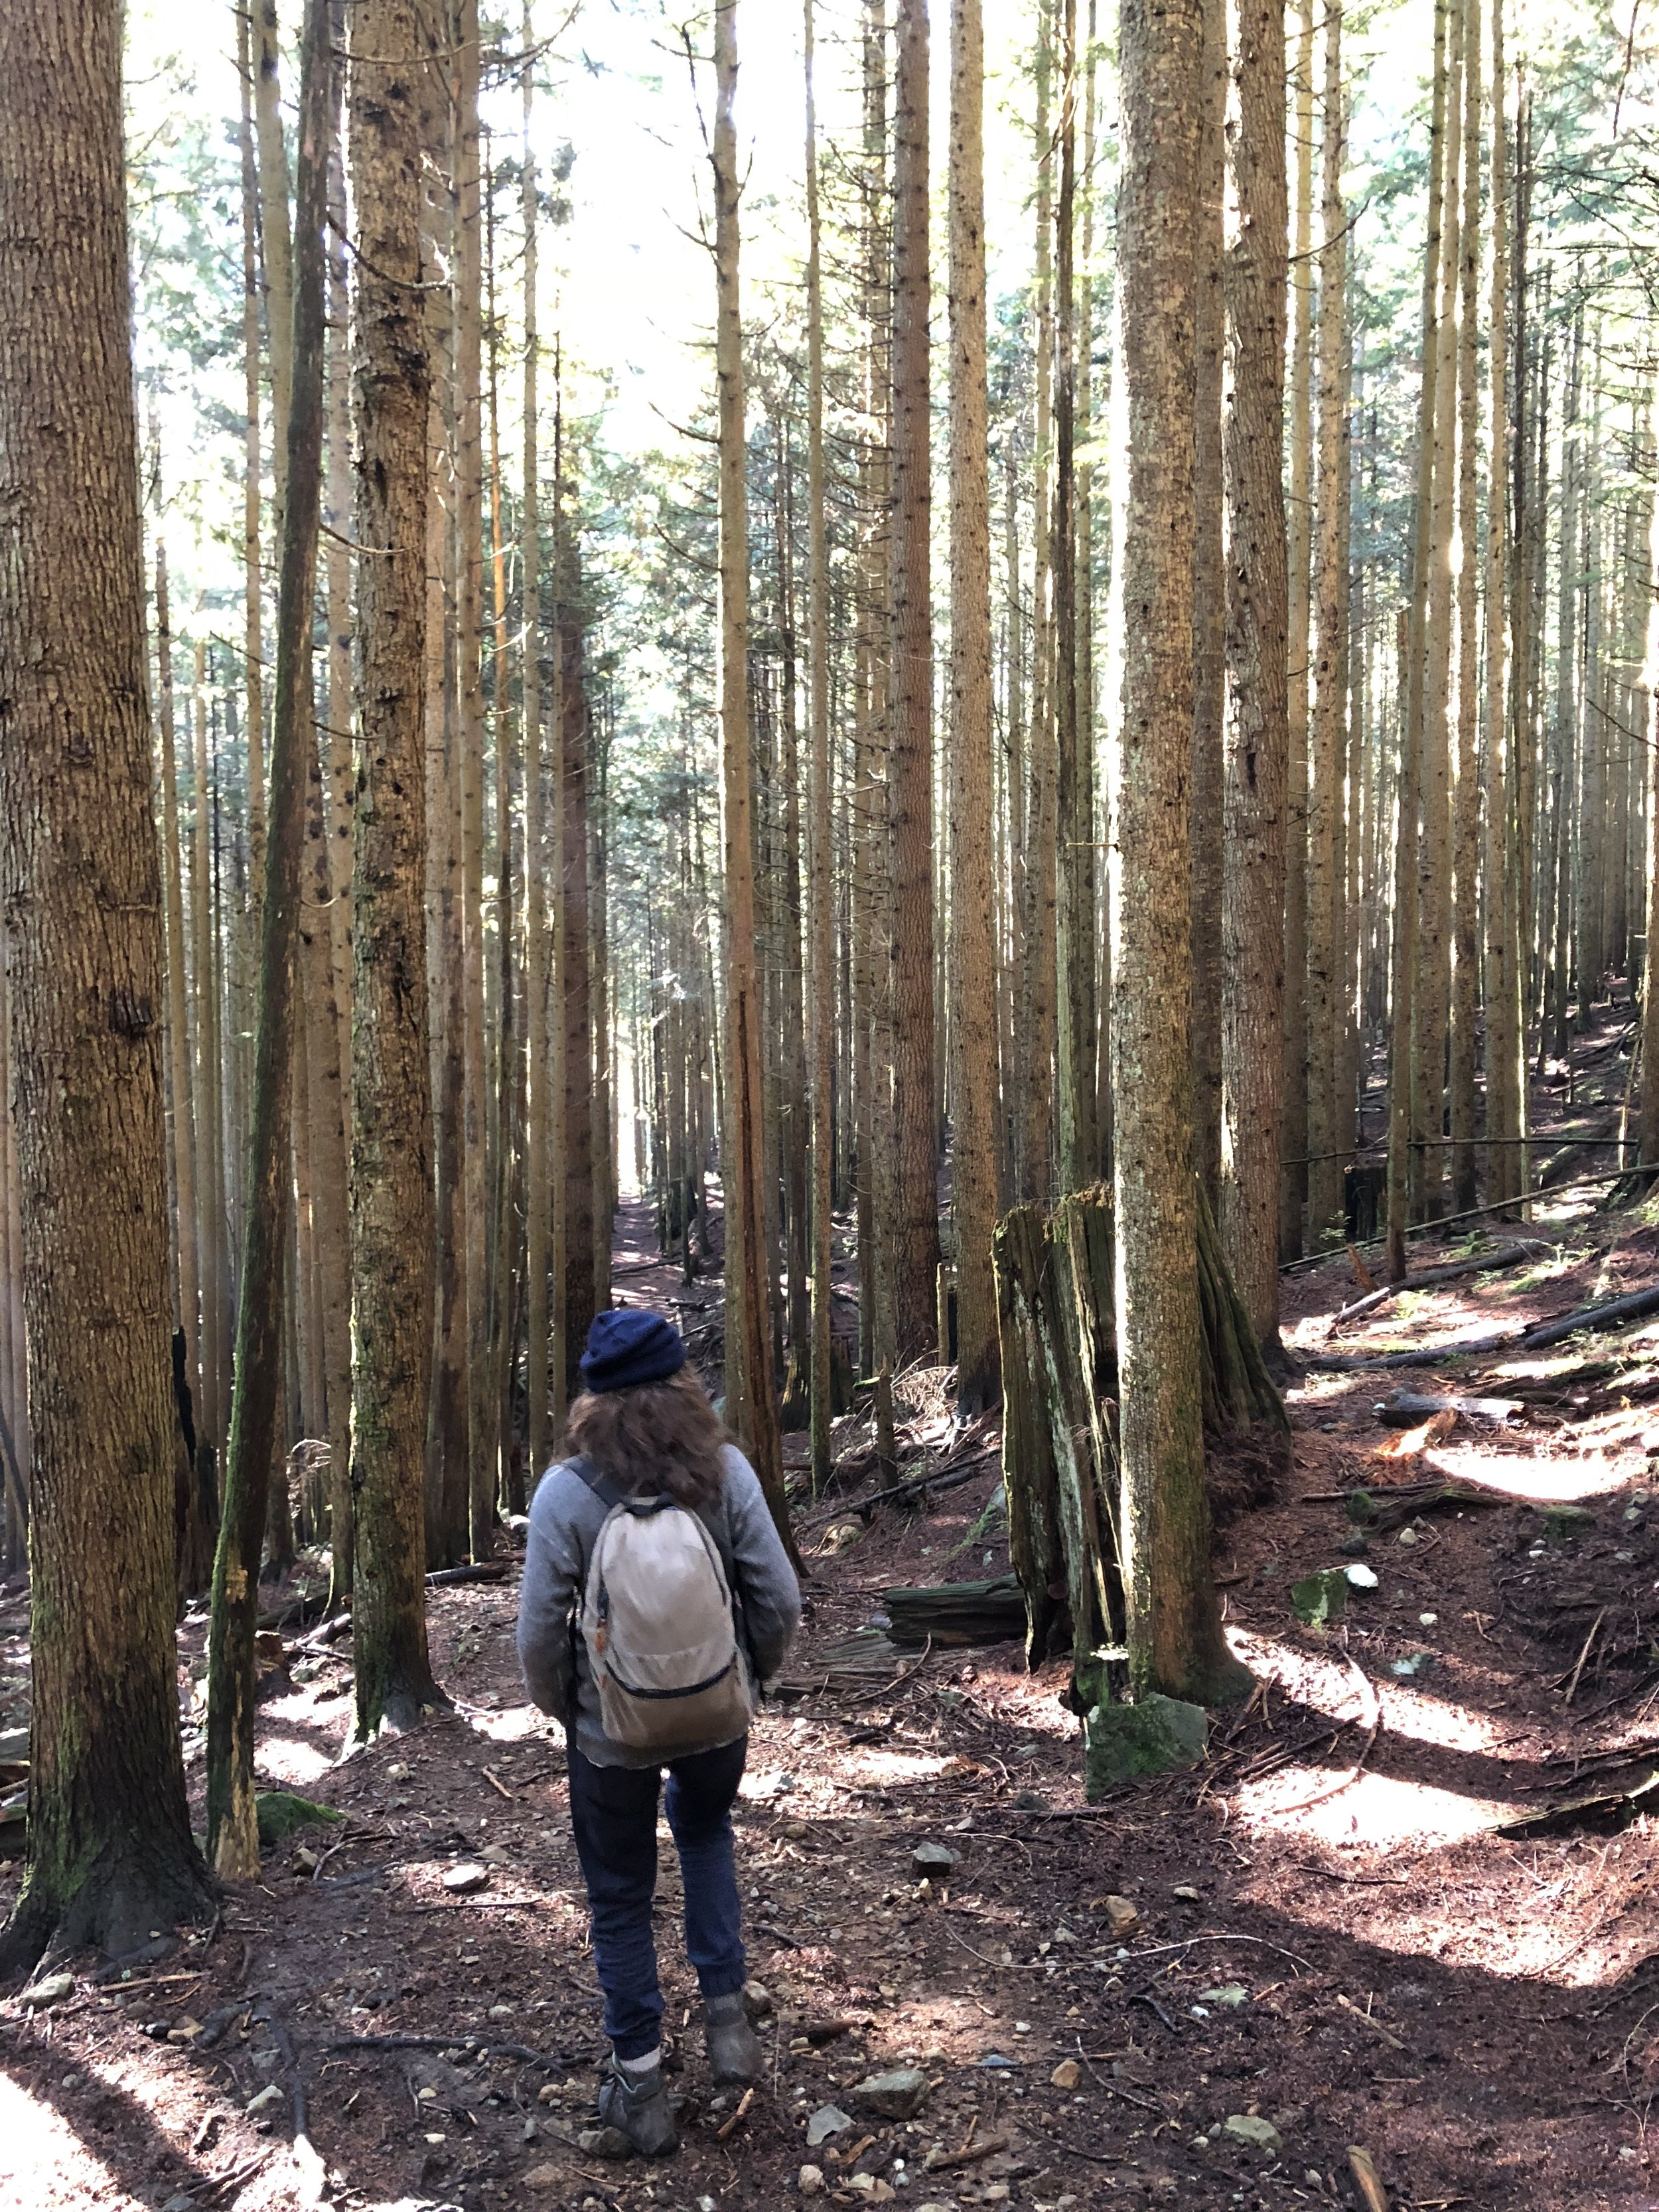 Walking along the old logging railway. Photo: Stephen Hui.